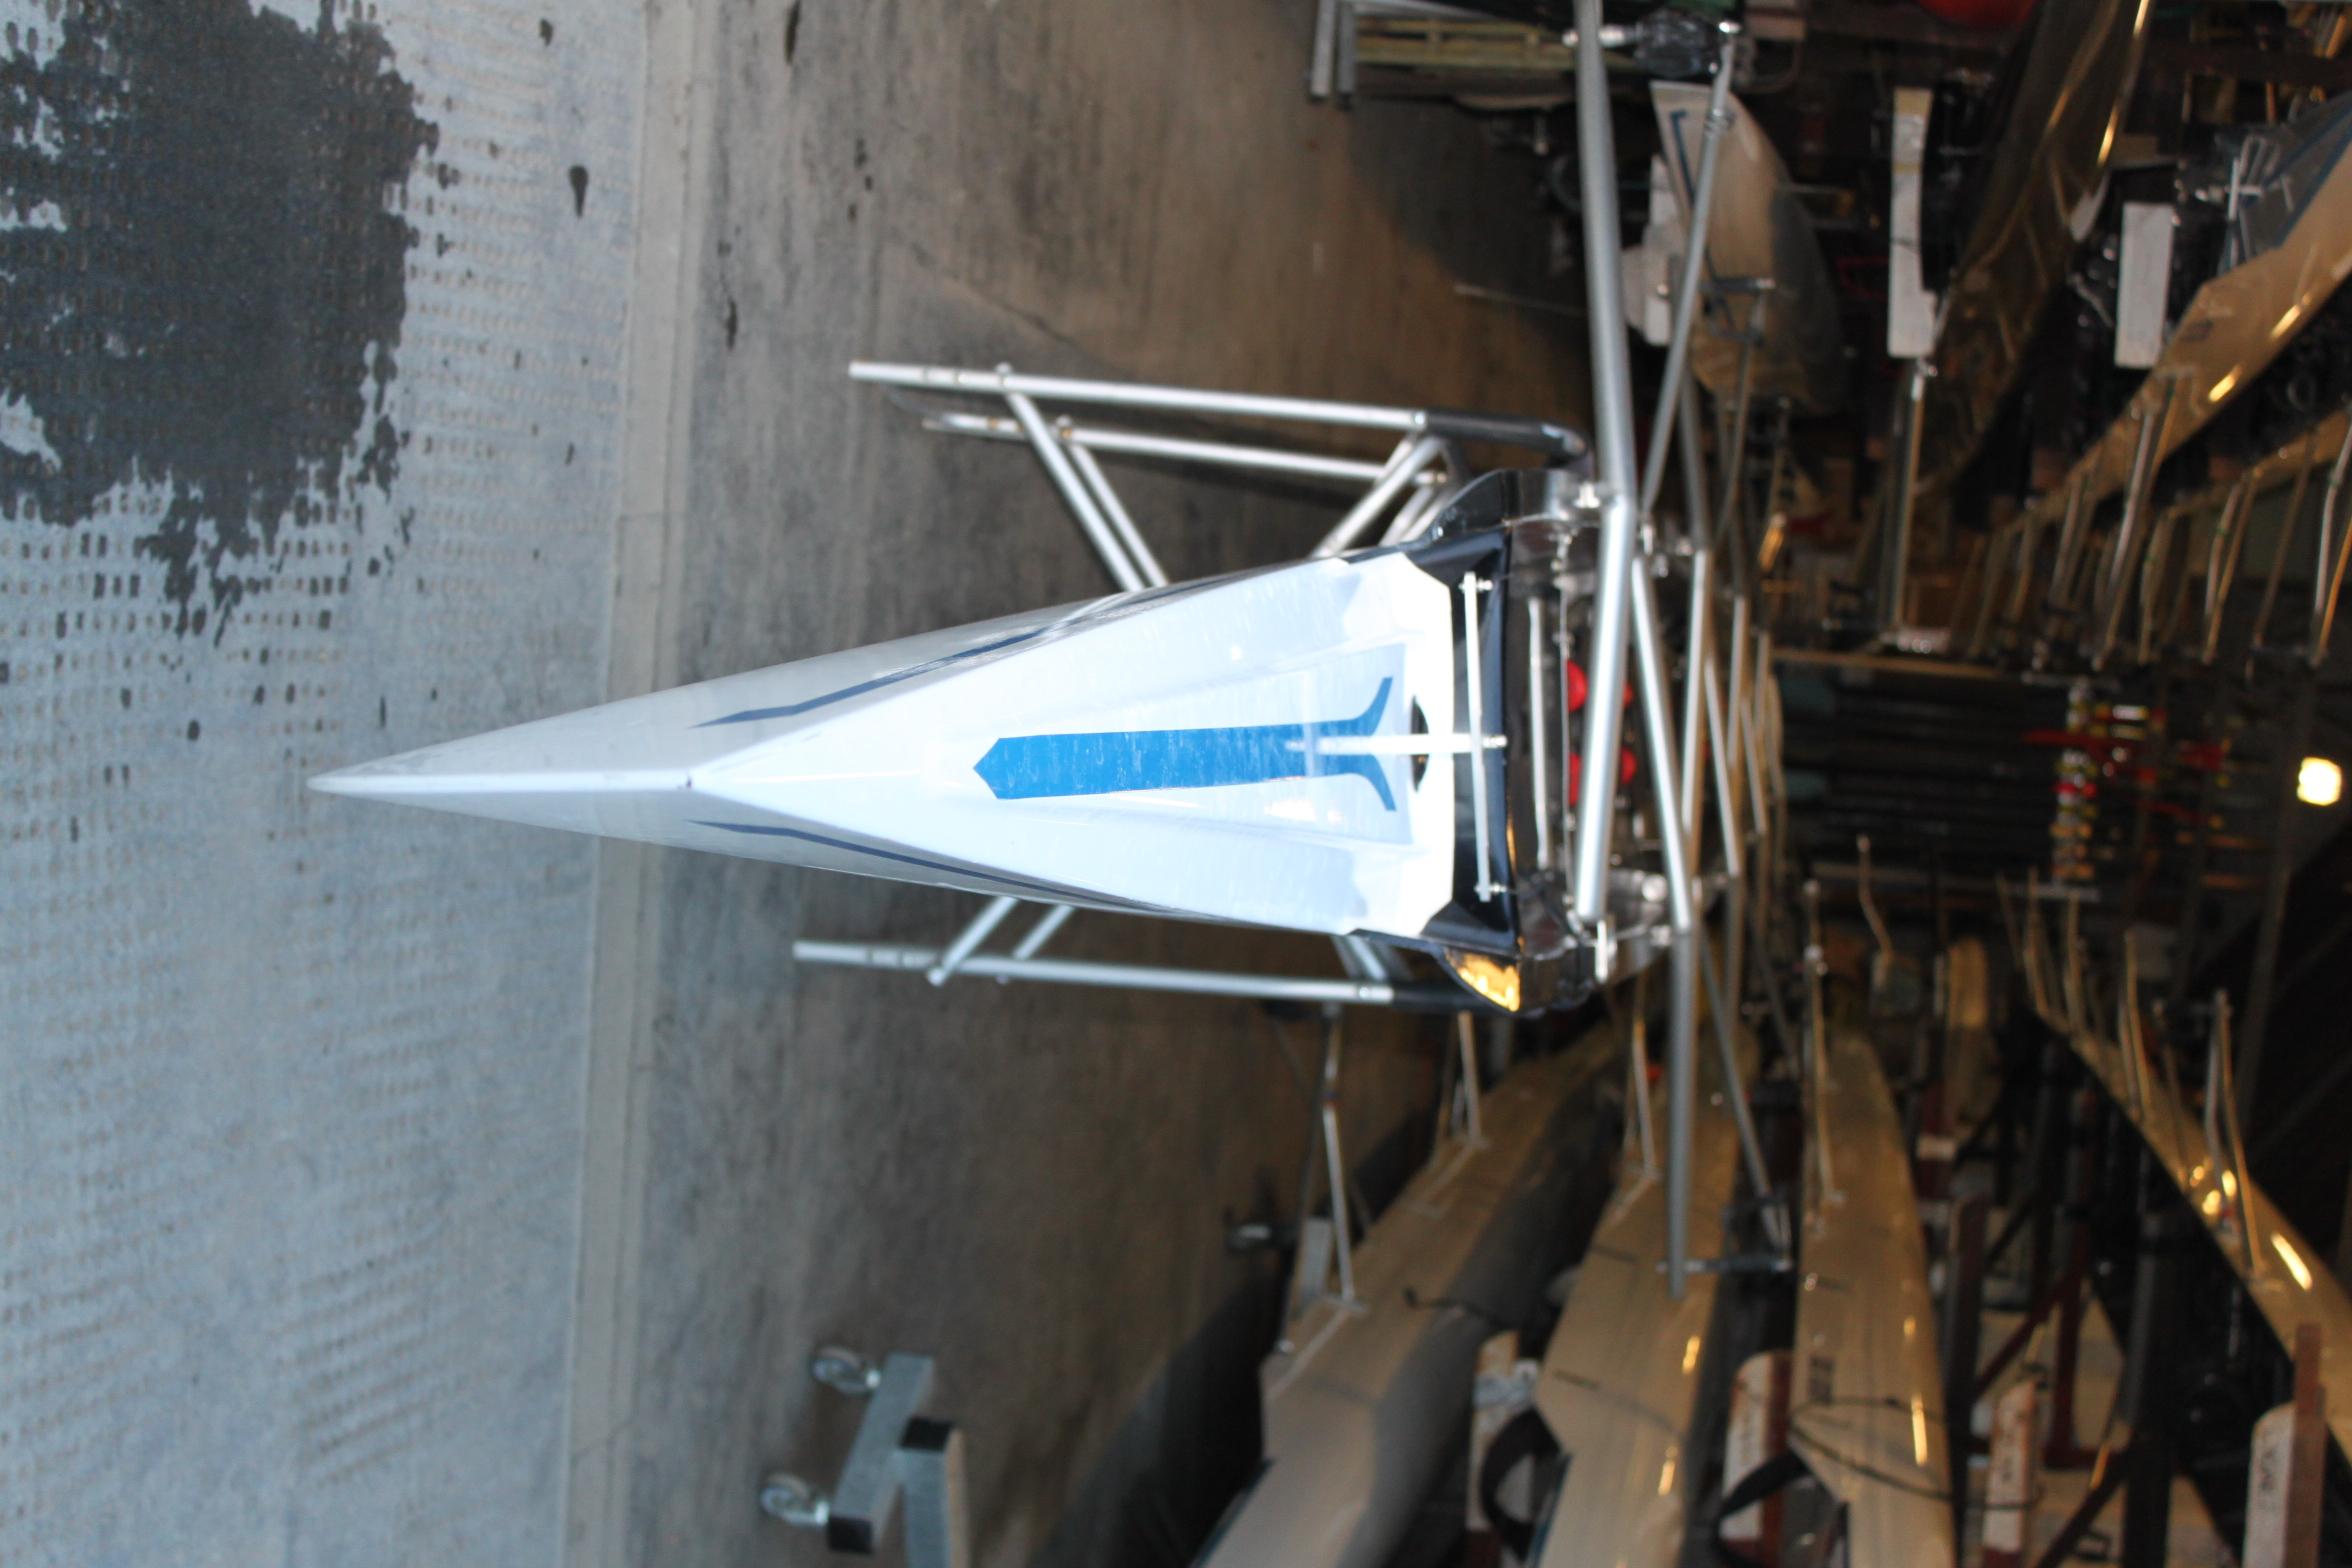 Filippi 8+ F9 For Sale